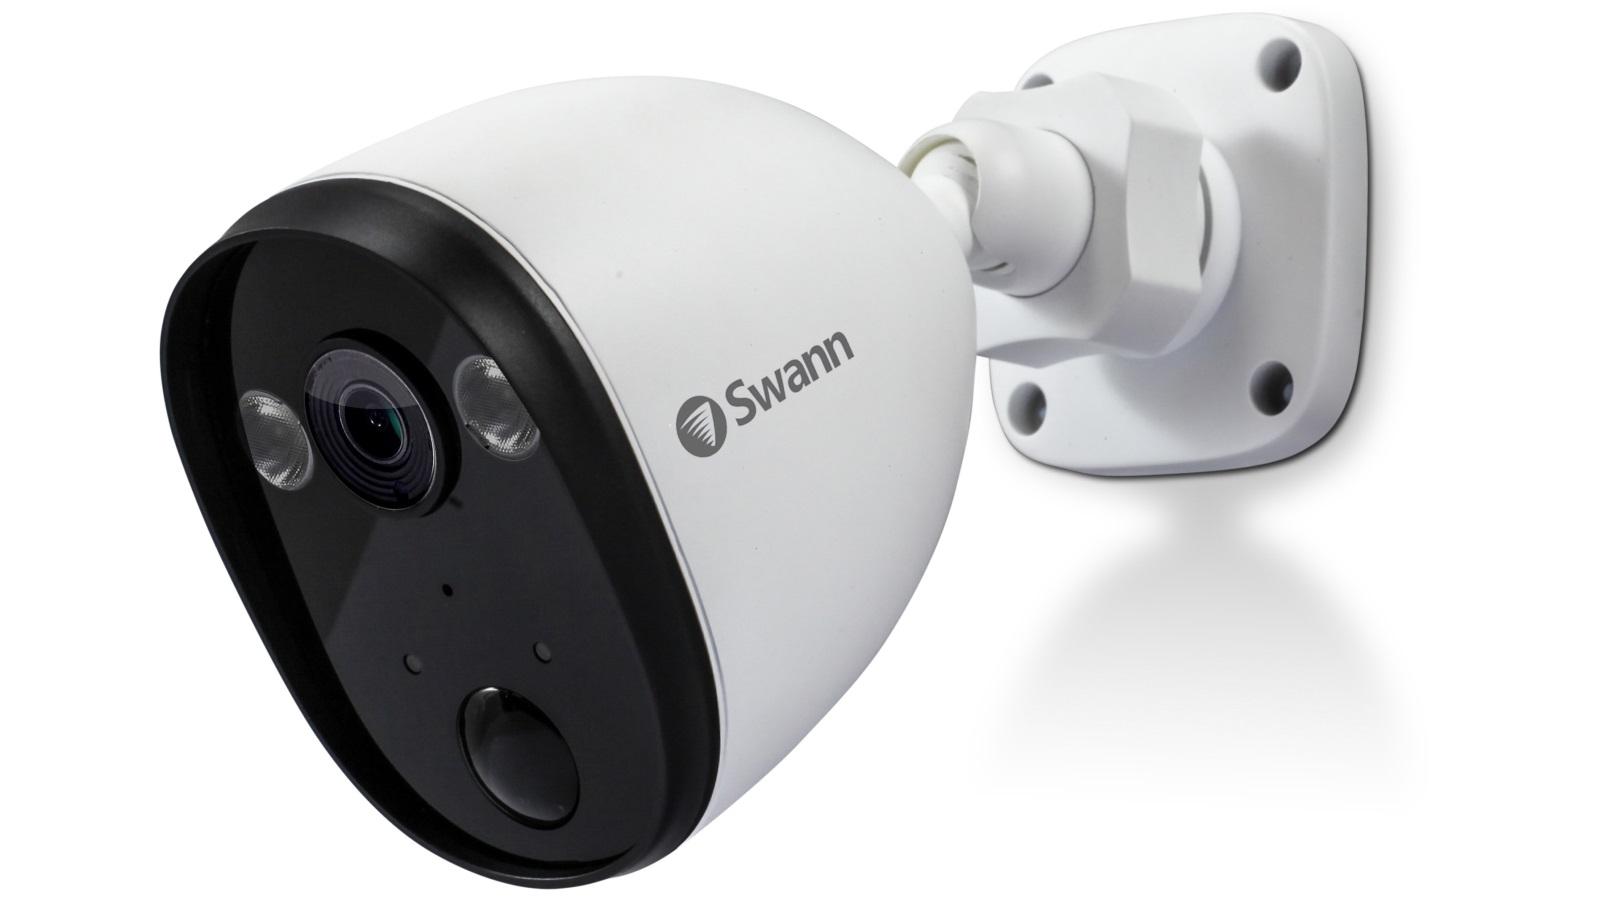 Buy Swann 1080p Wifi Spotlight Outdoor Security Camera Harvey Norman Au